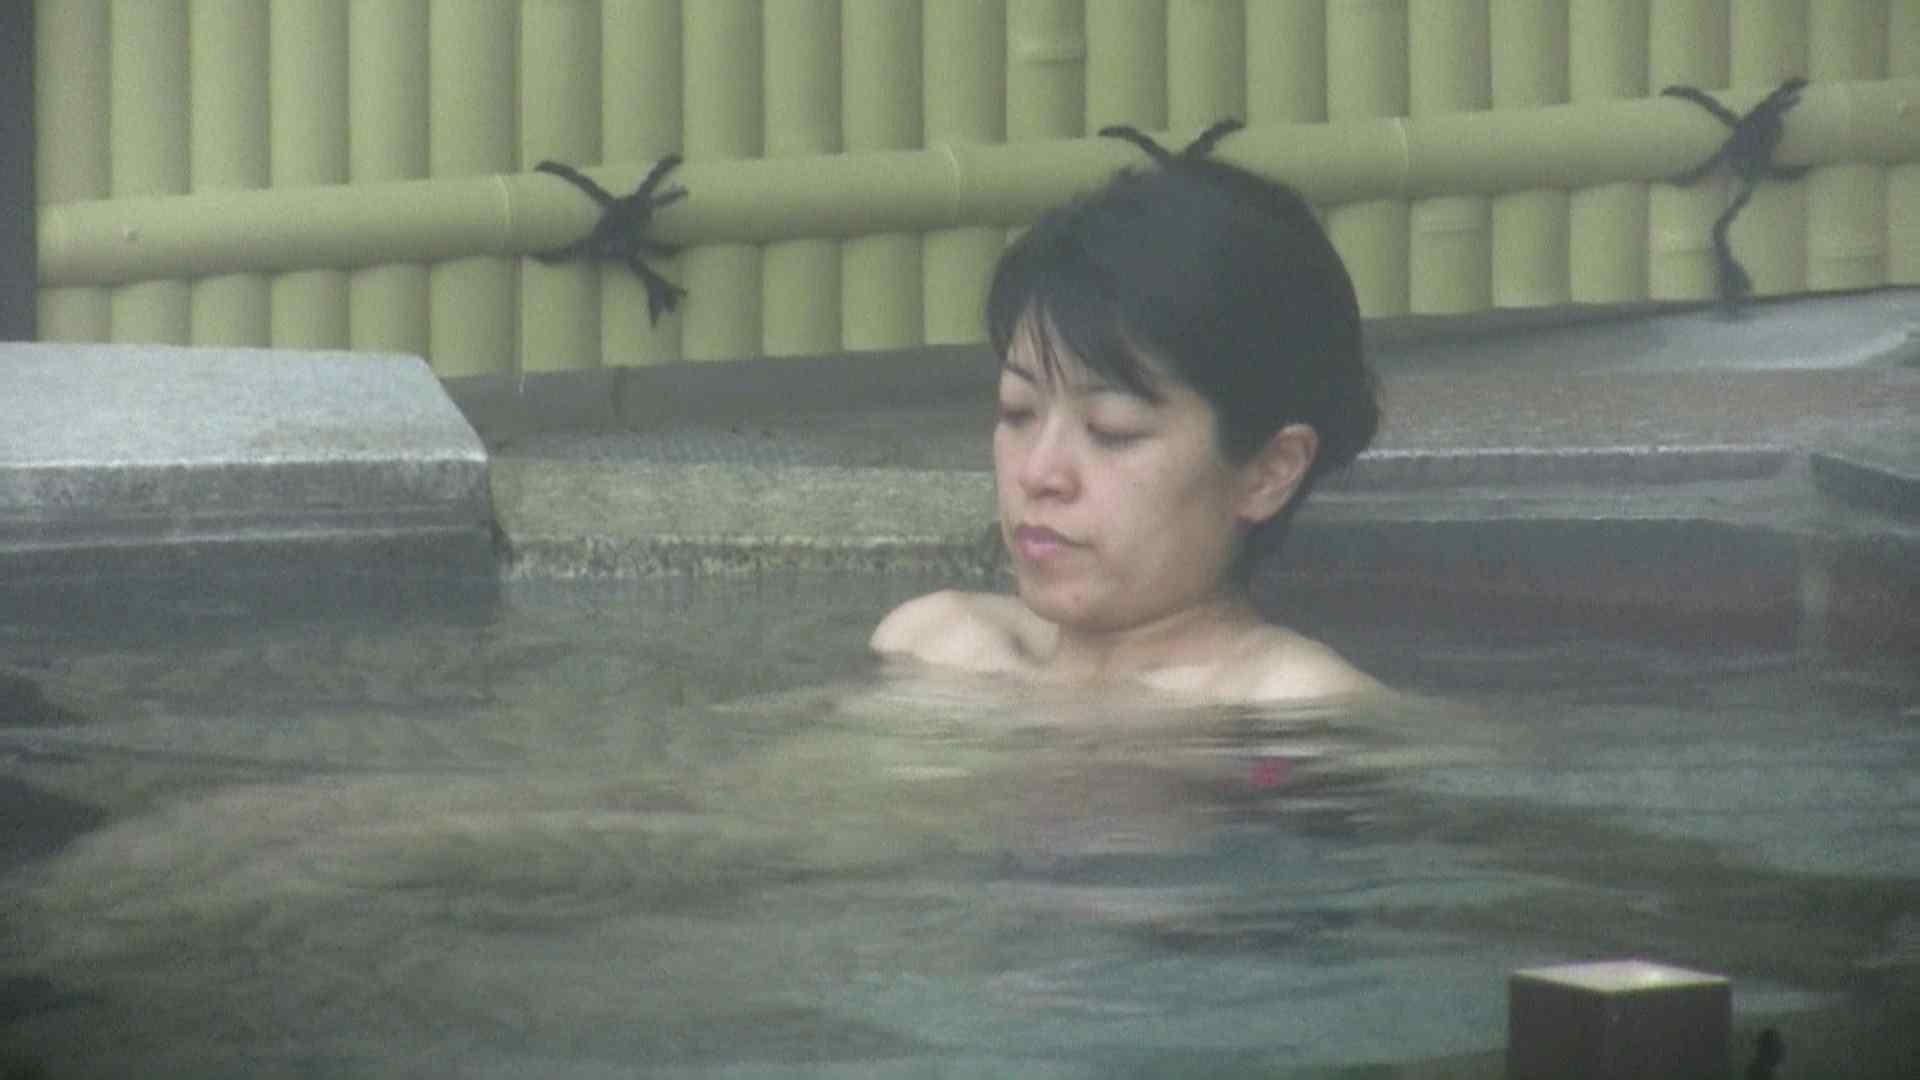 Aquaな露天風呂Vol.585 HなOL | 盗撮  93pic 74